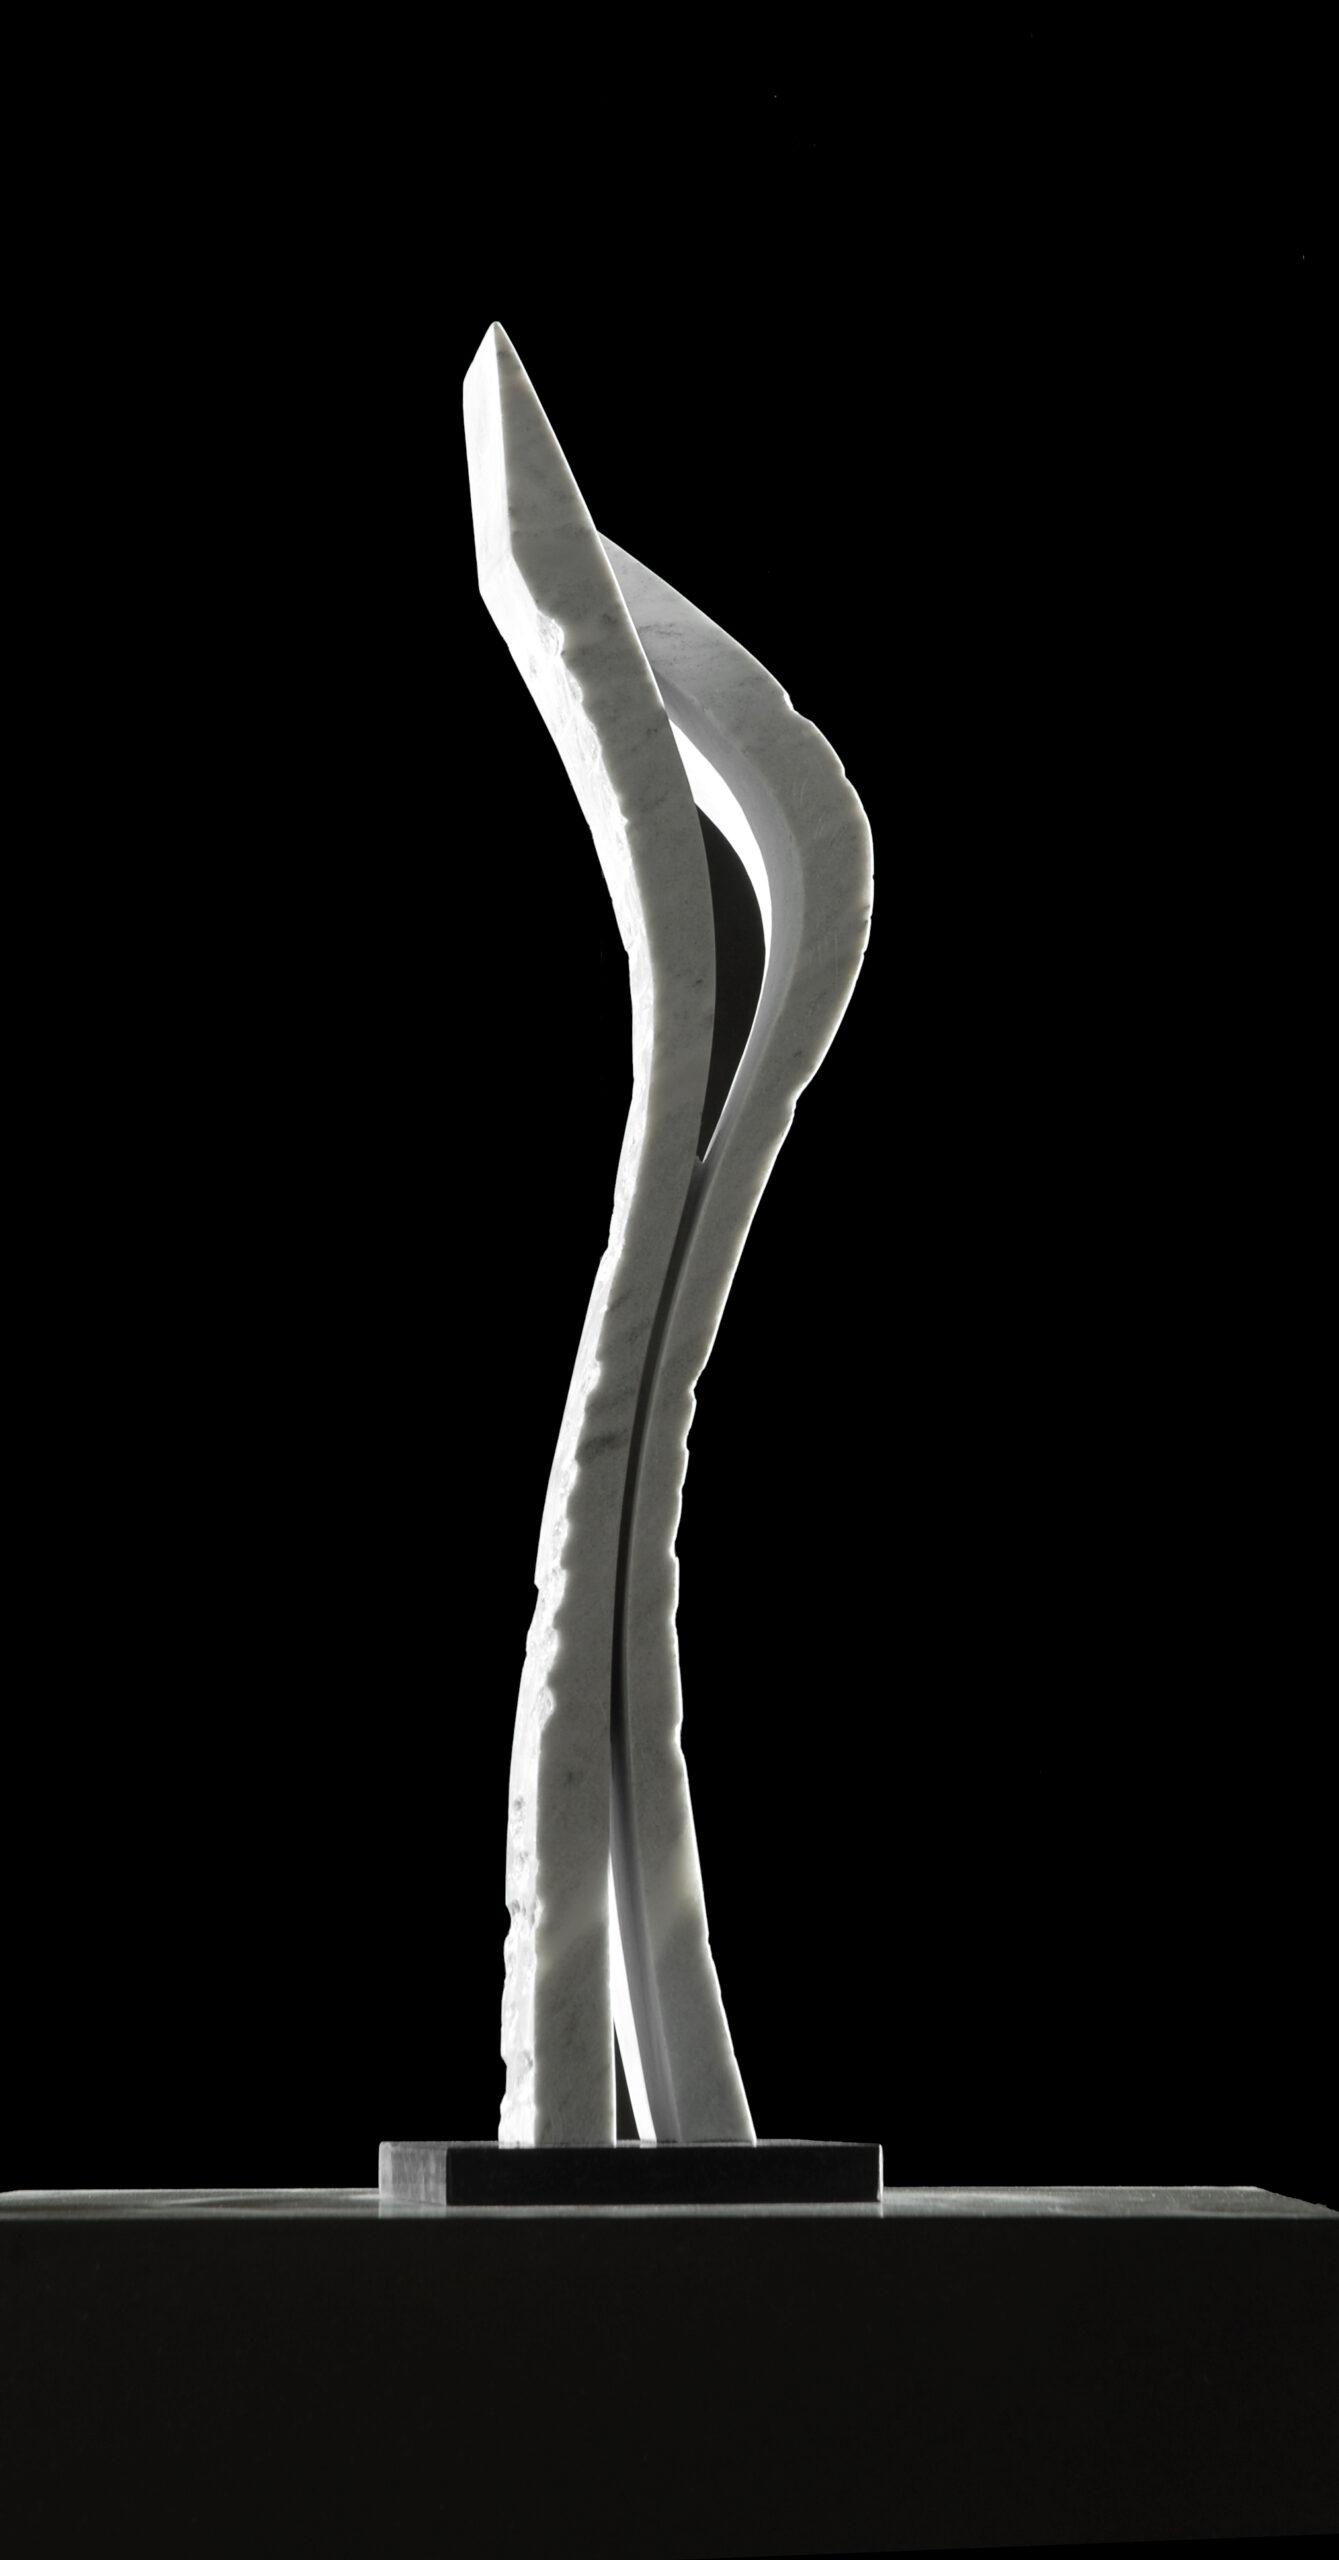 Frank Teufel: o.T., griechischer Marmor, Höhe 70 cm © Premium Modern Art, 4.000 Eur